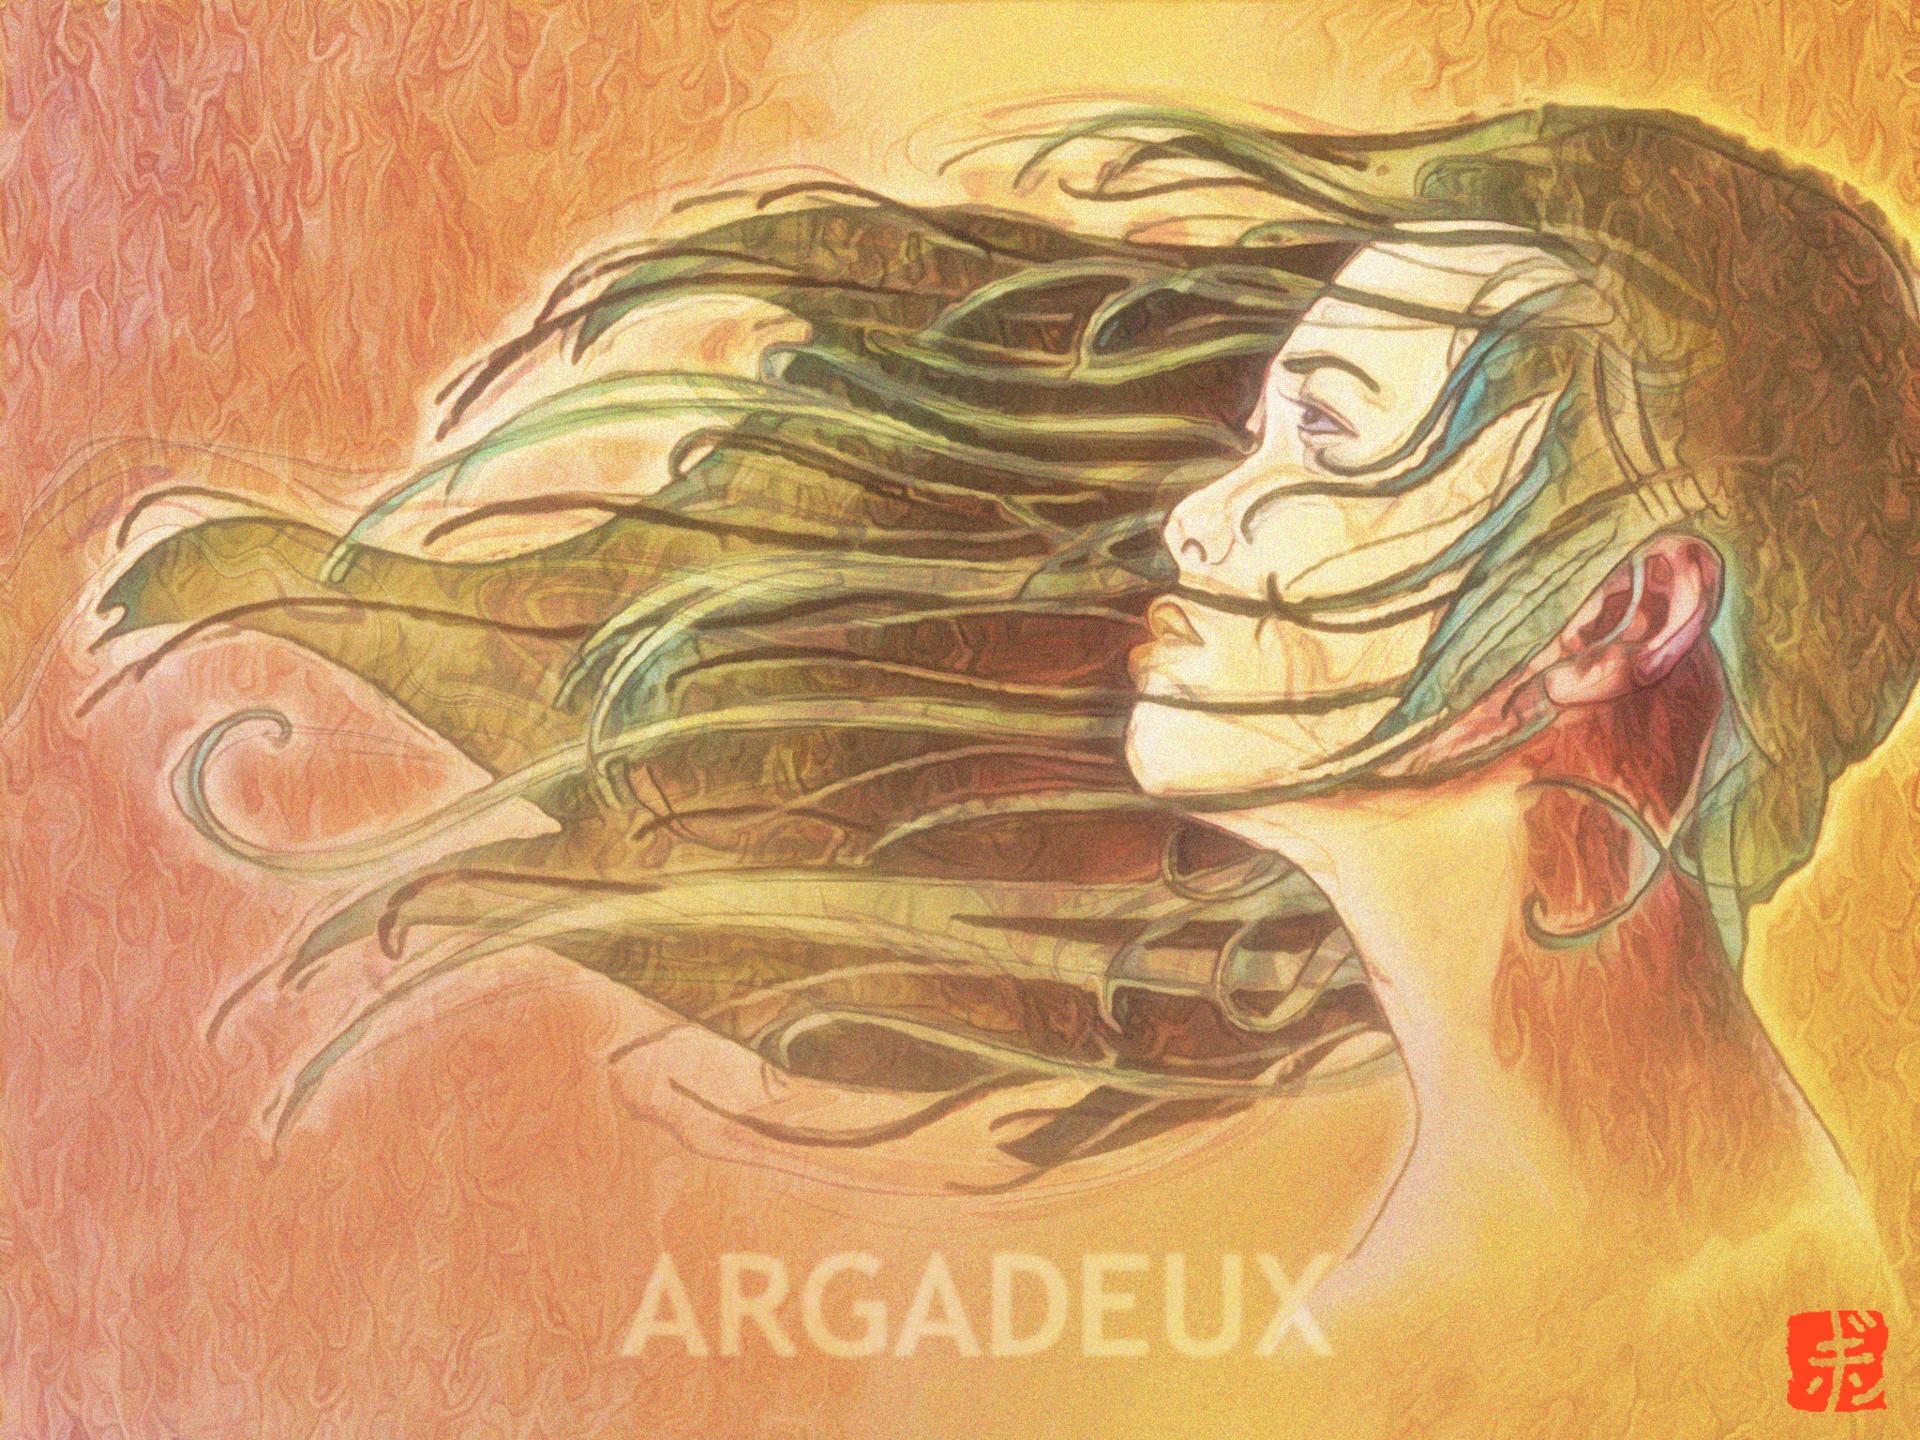 Argadeux img 9498